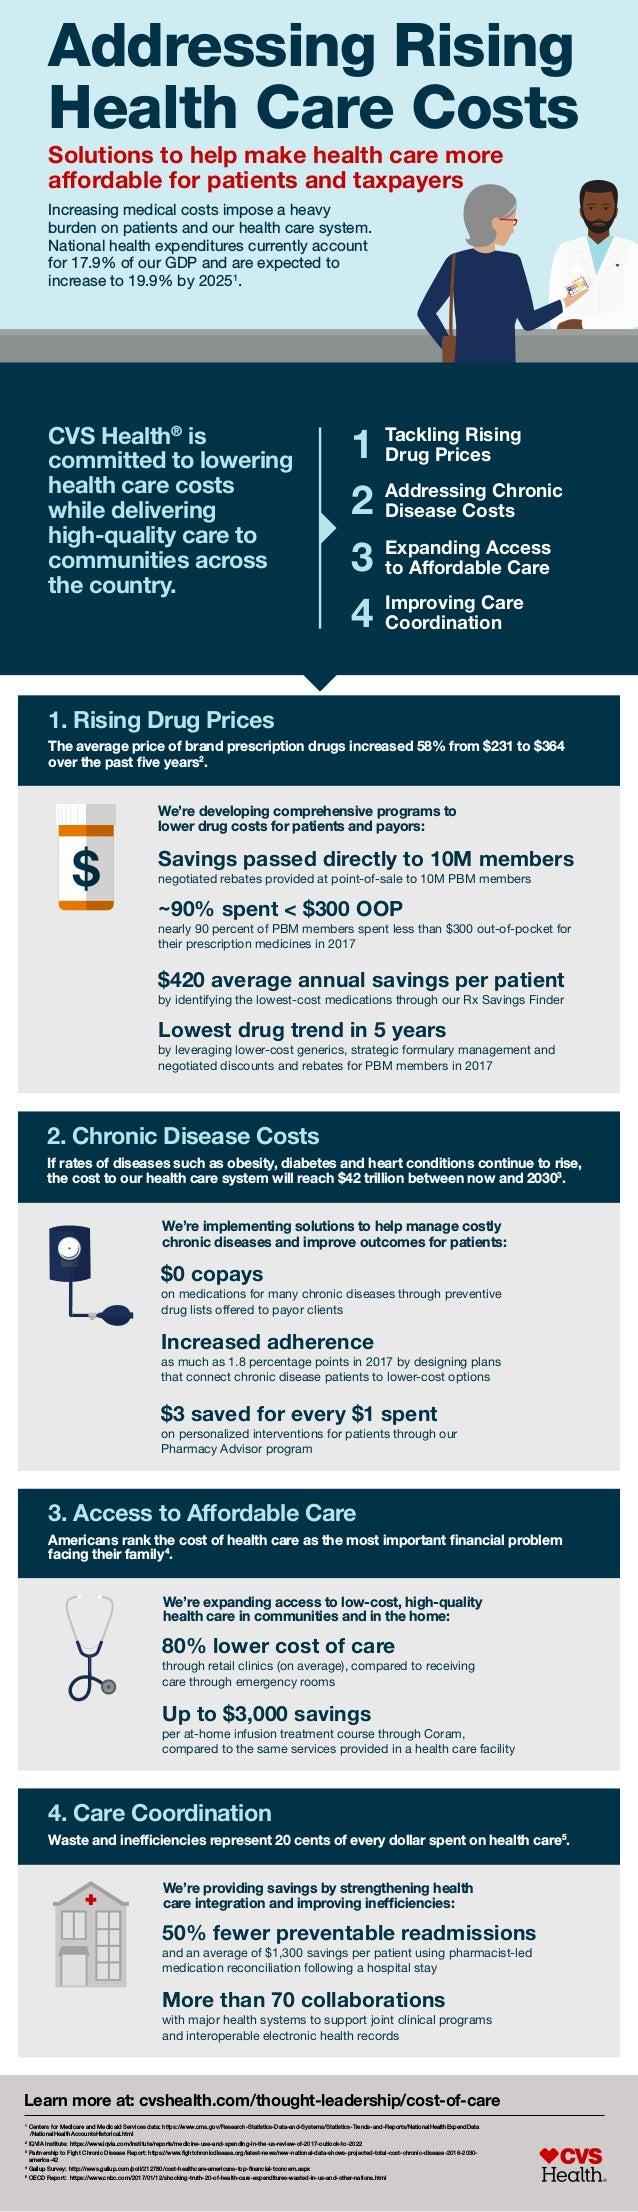 addressing rising health care costs cvs health